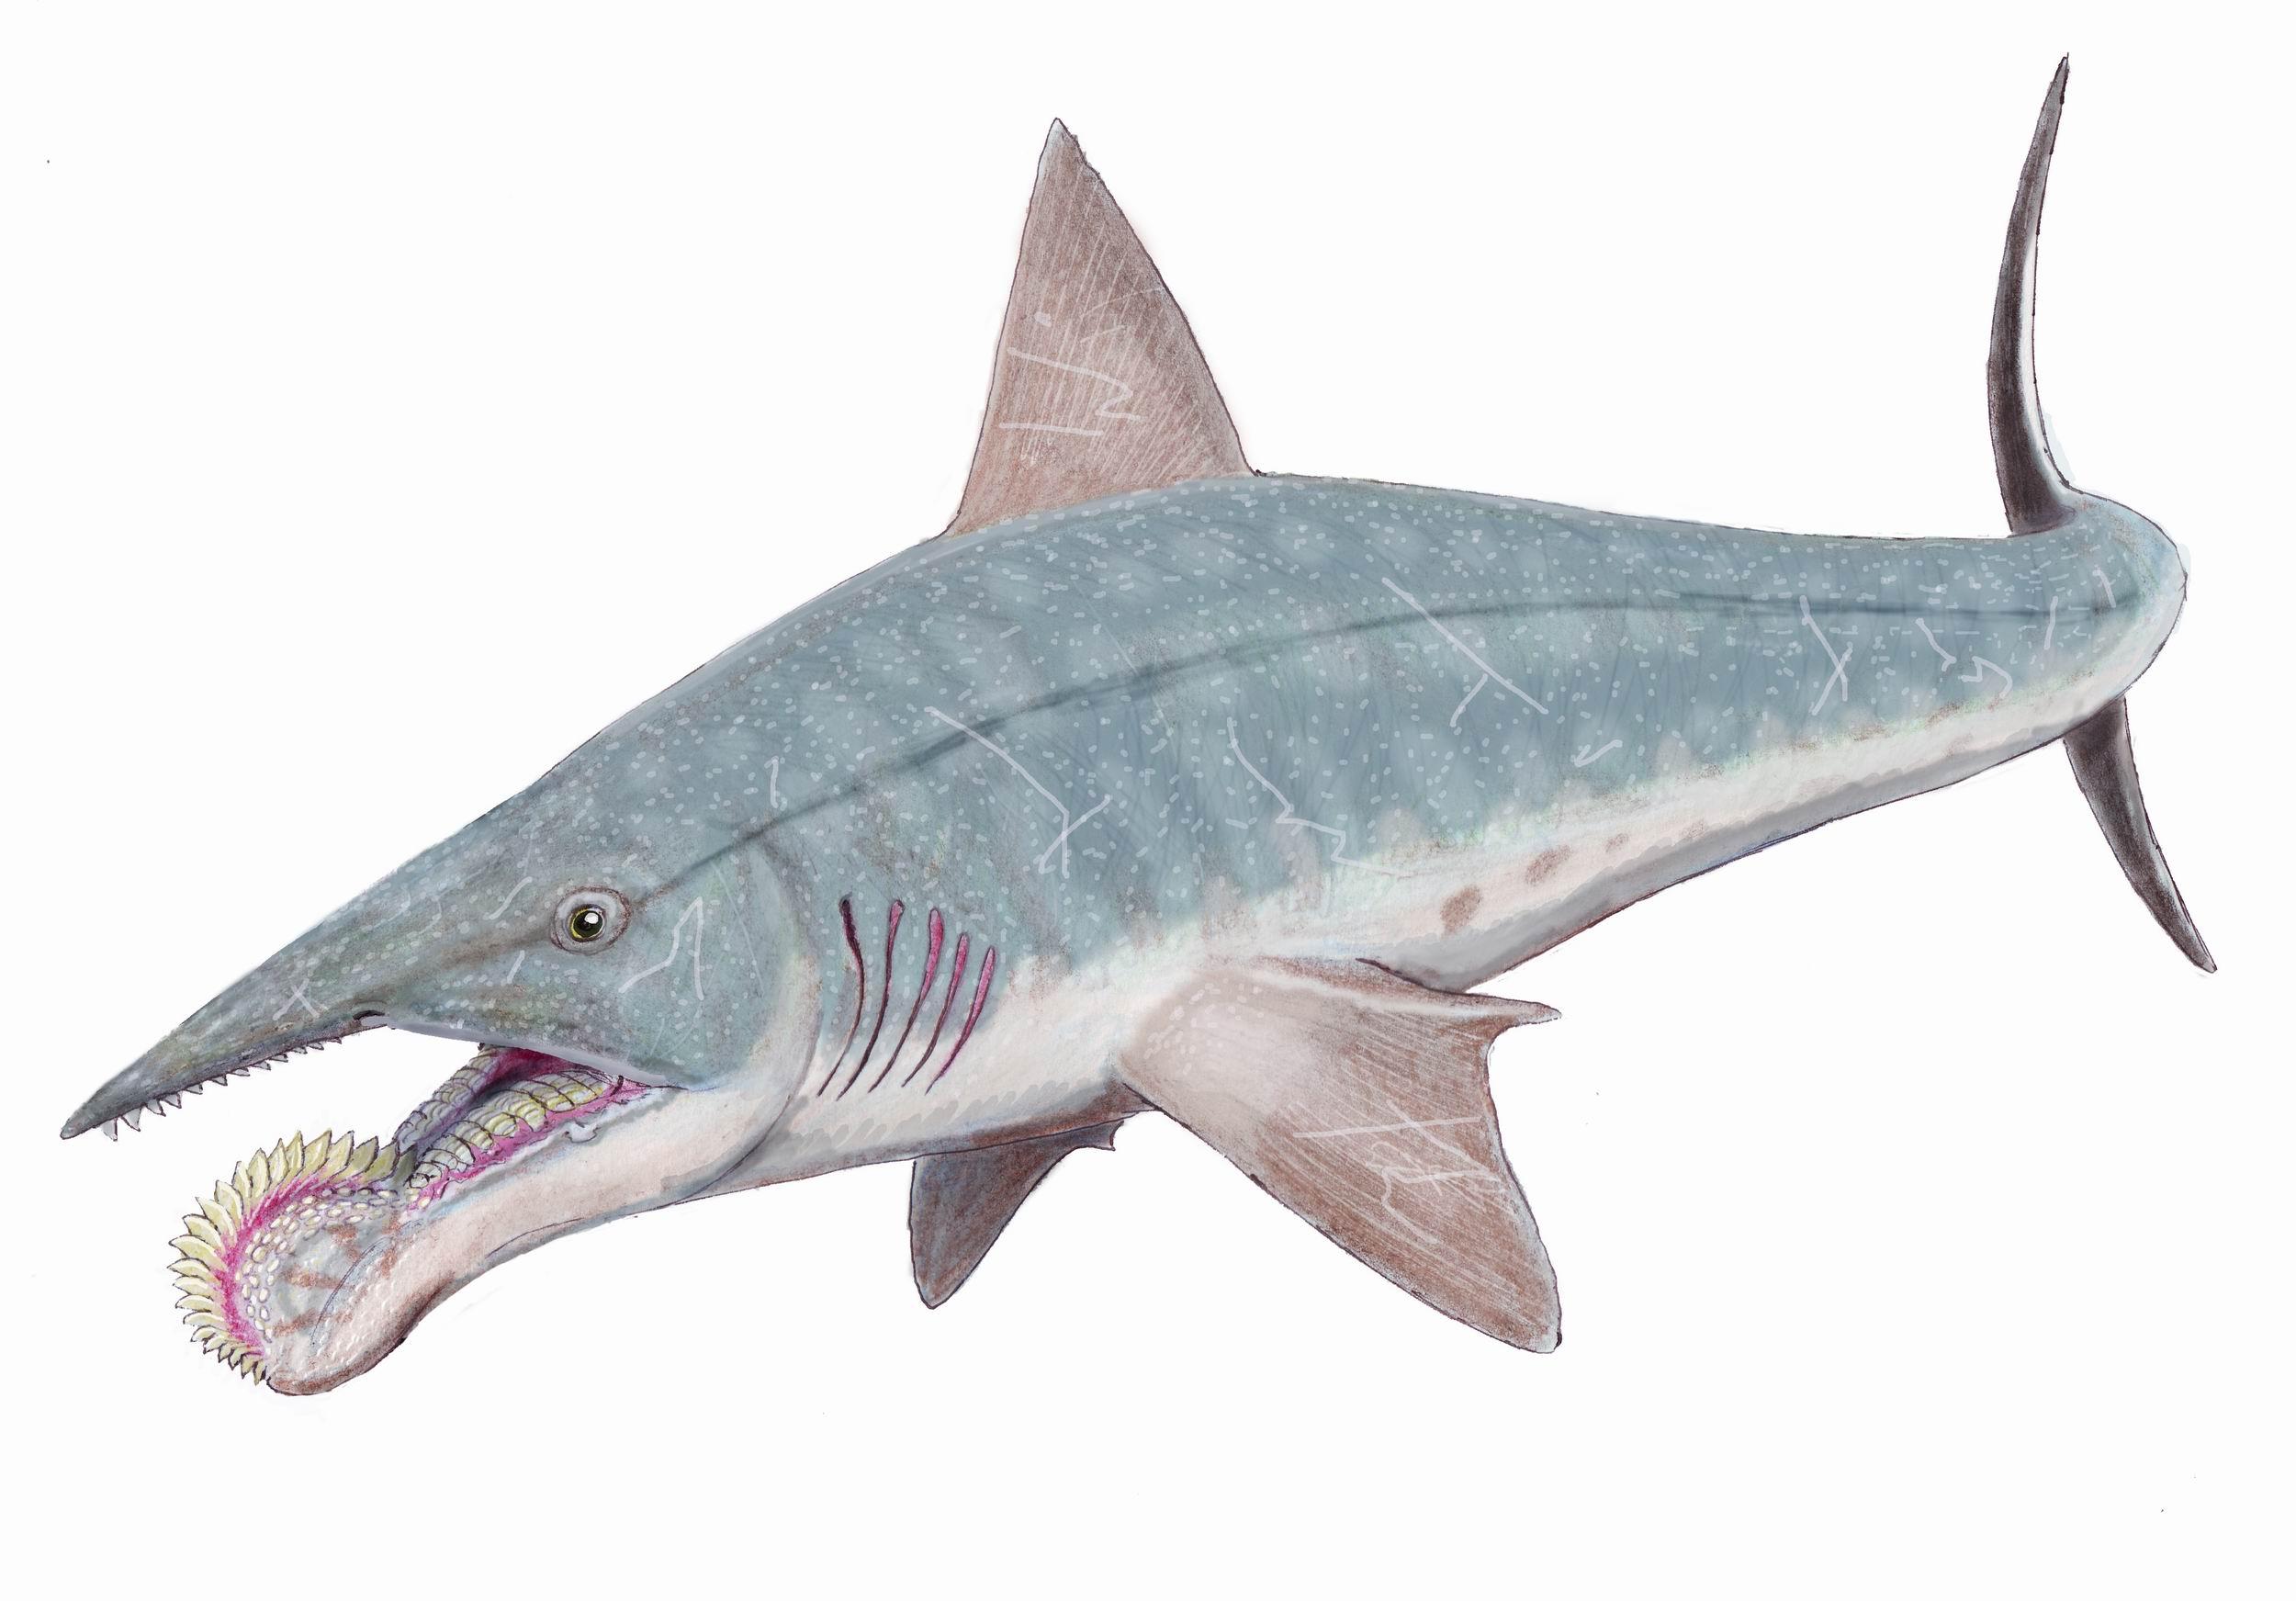 Tiburón | Geofrik\'s Blog